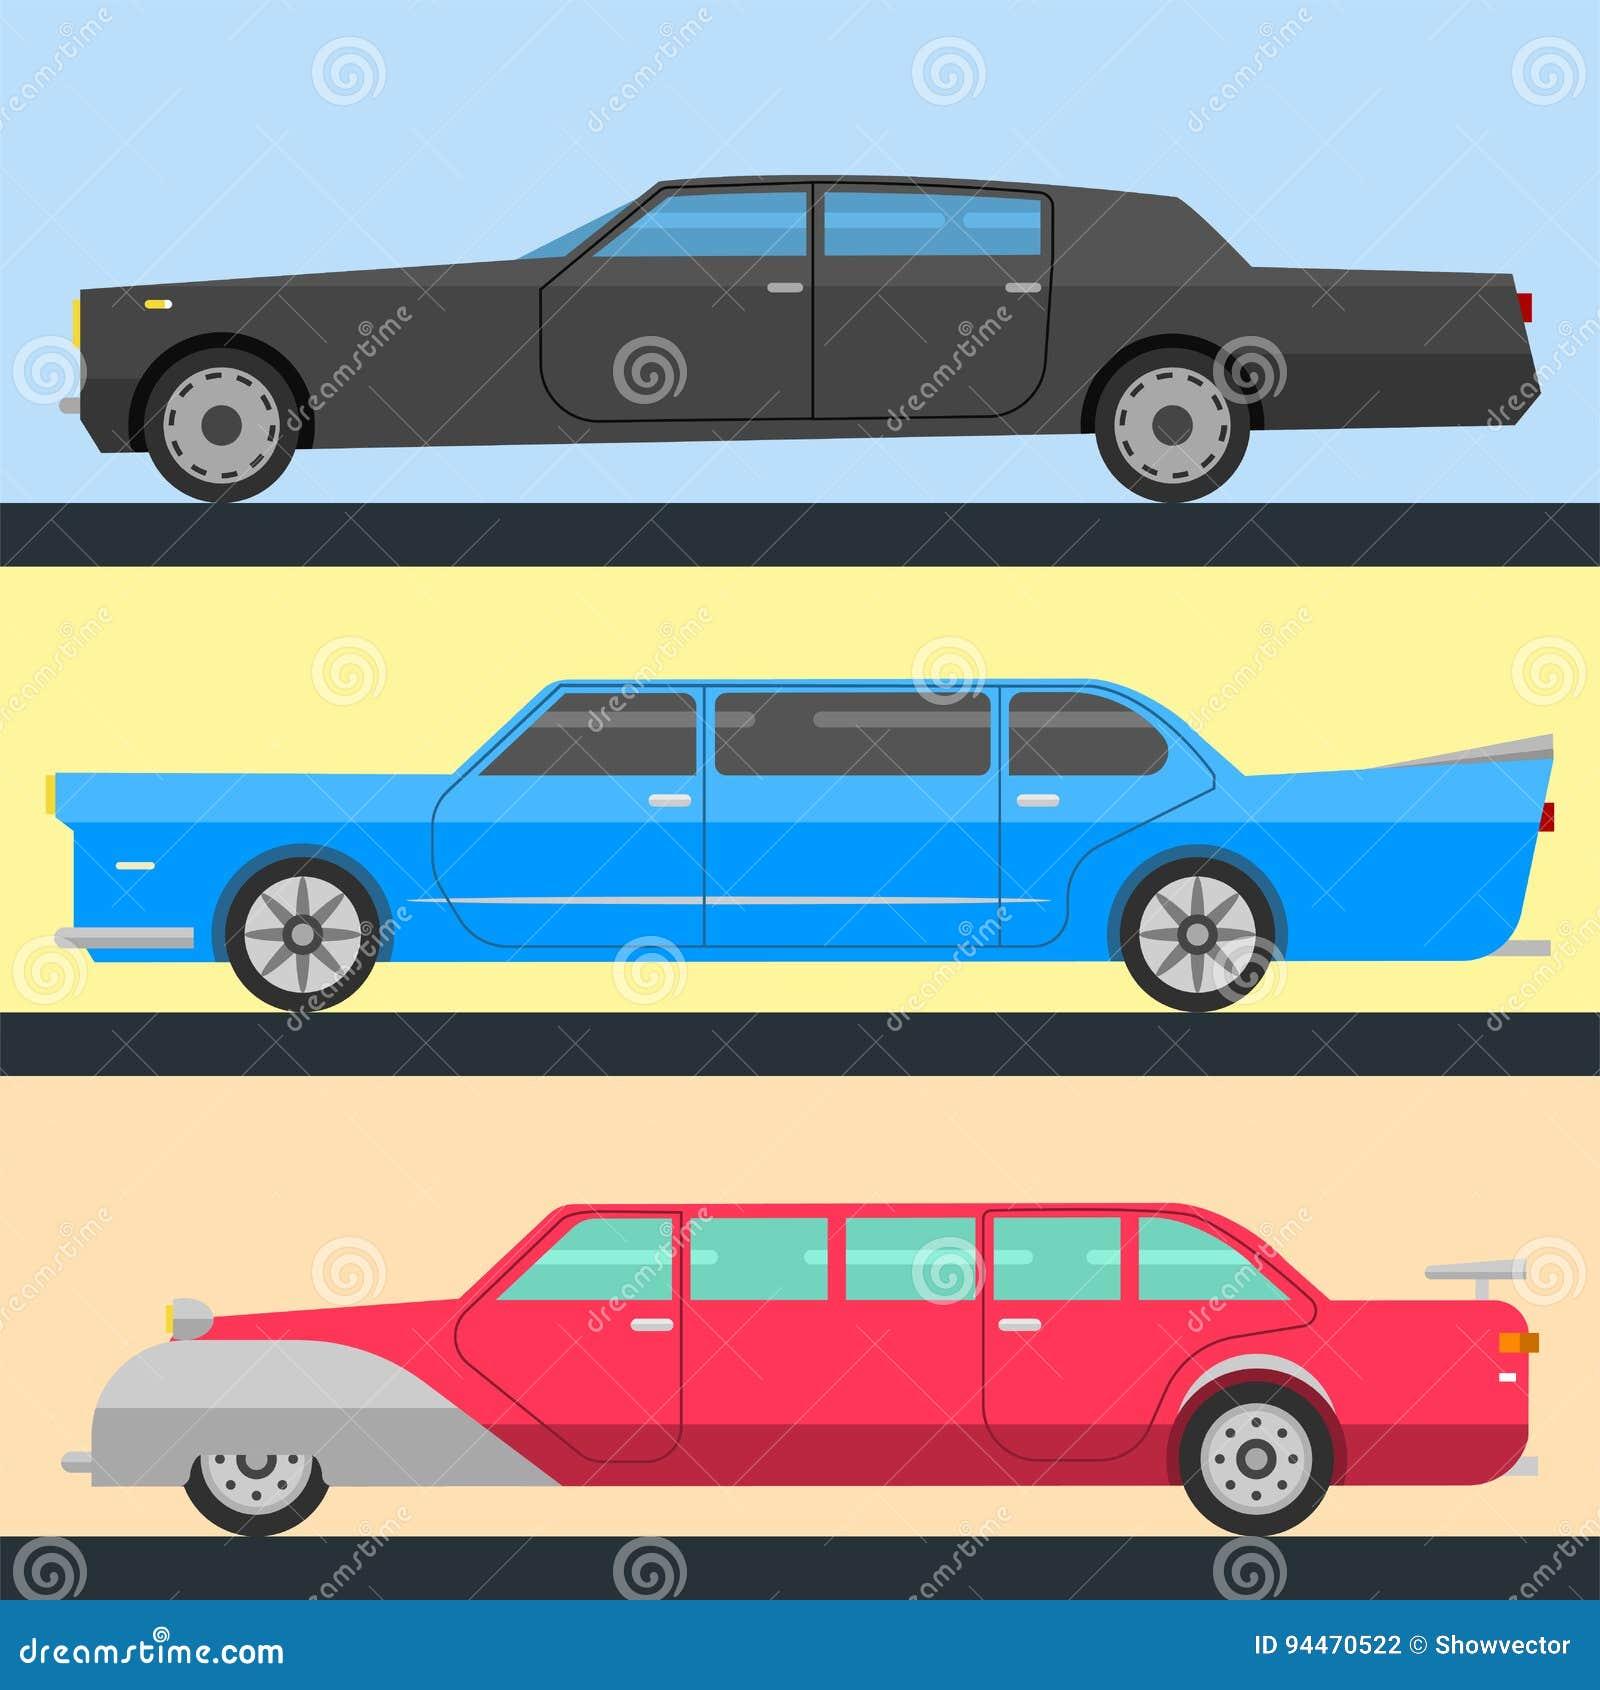 Motor Cartoons, Illustrations & Vector Stock Images